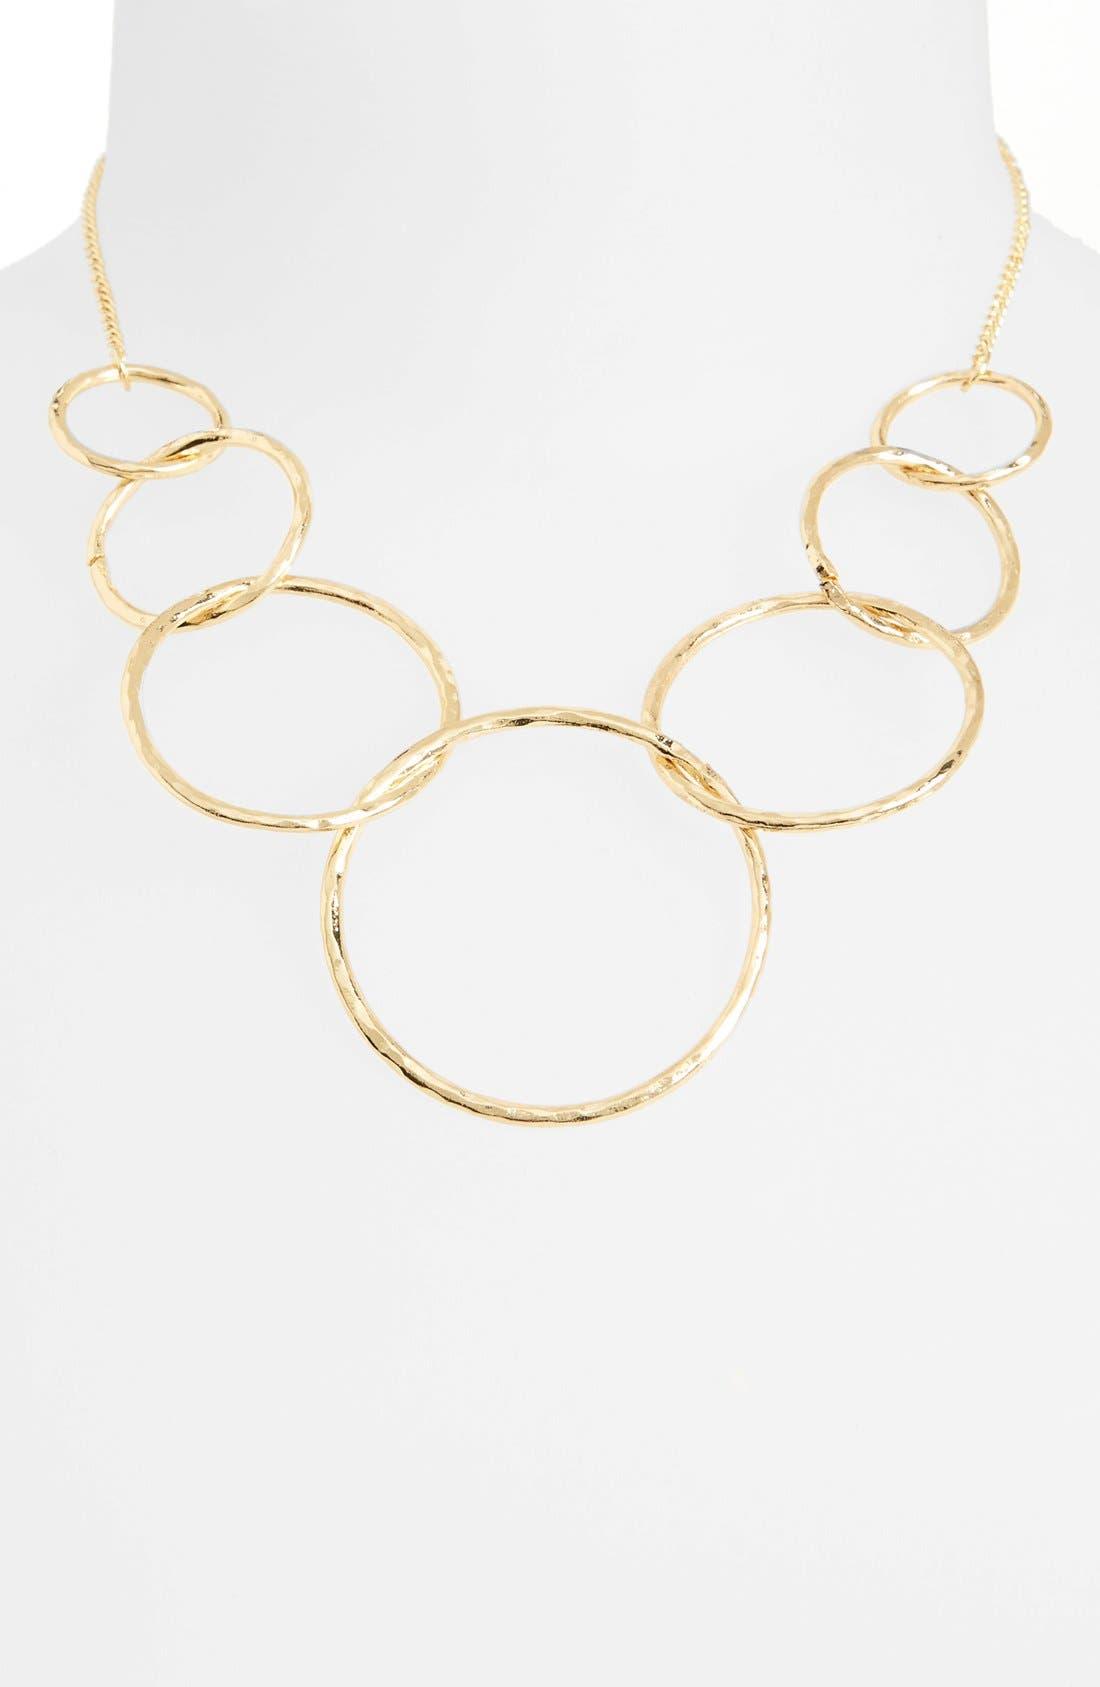 Main Image - Panacea Circle Link Necklace